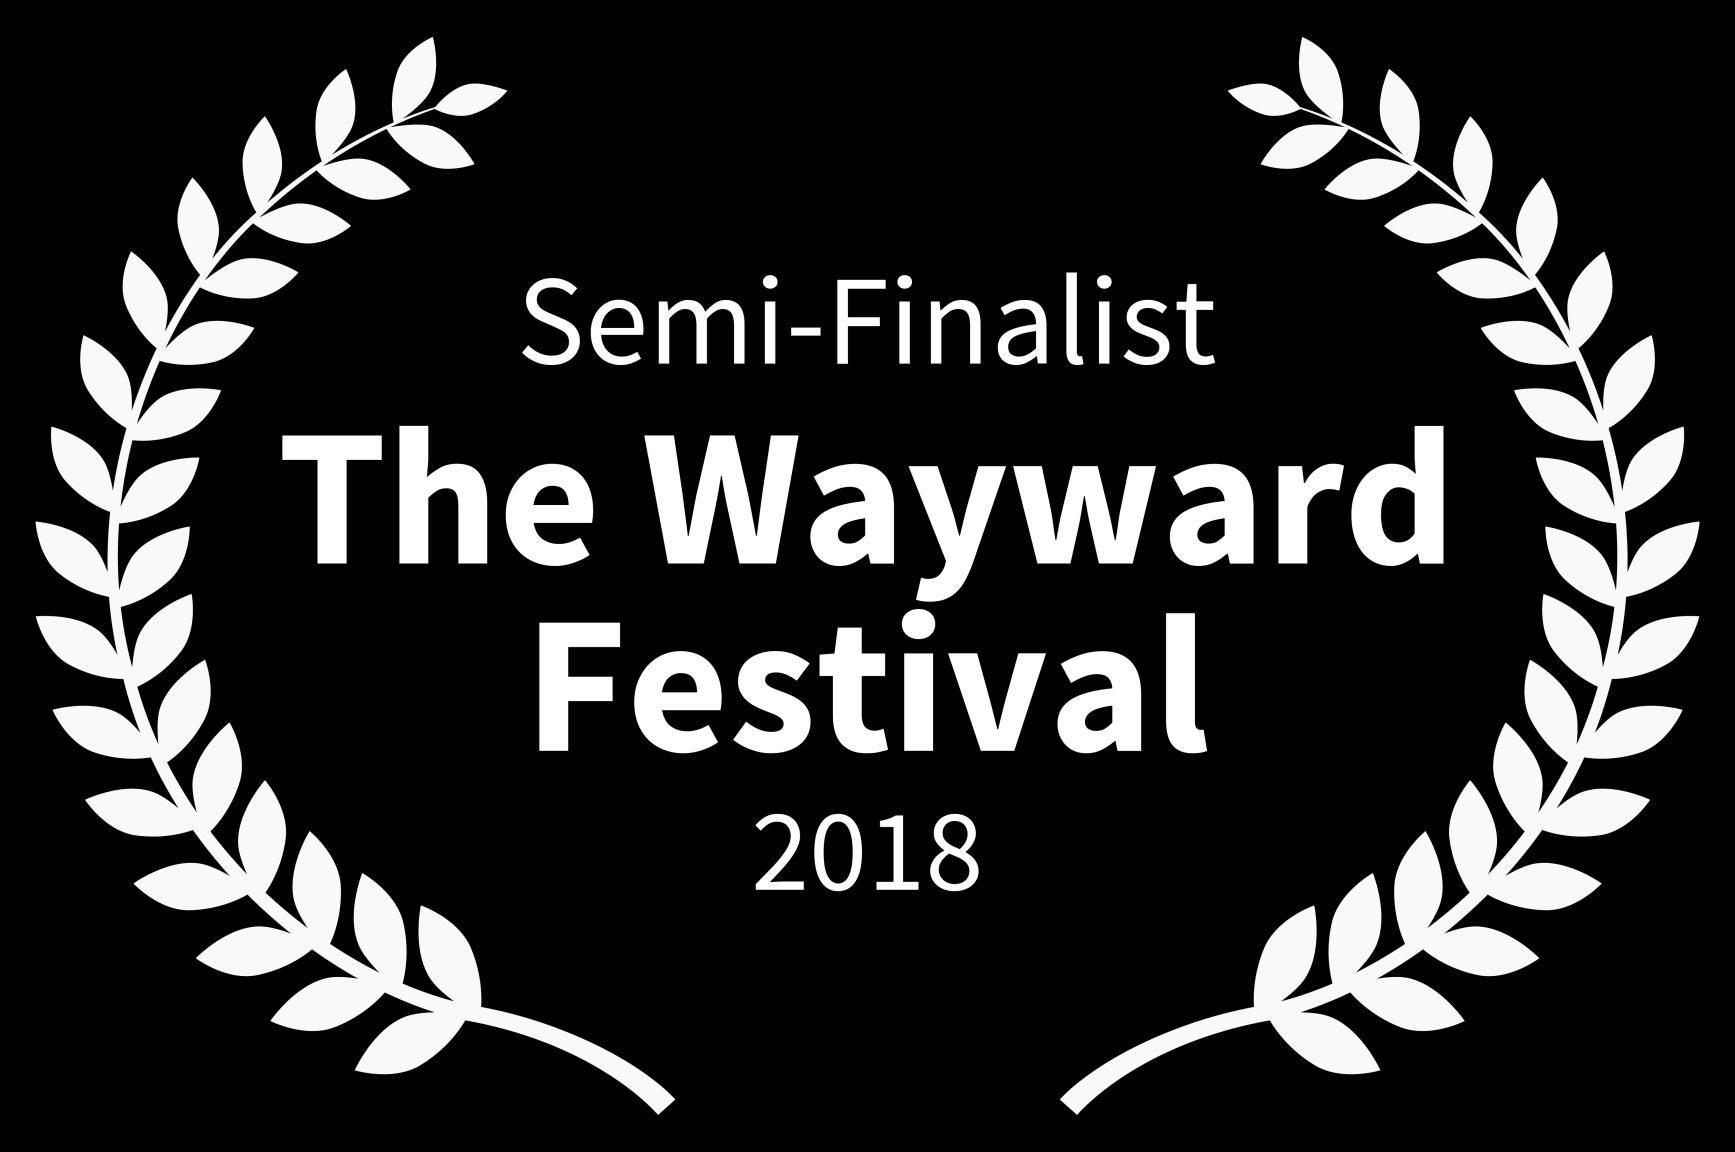 Semi-Finalist - The Wayward Festival.jpg